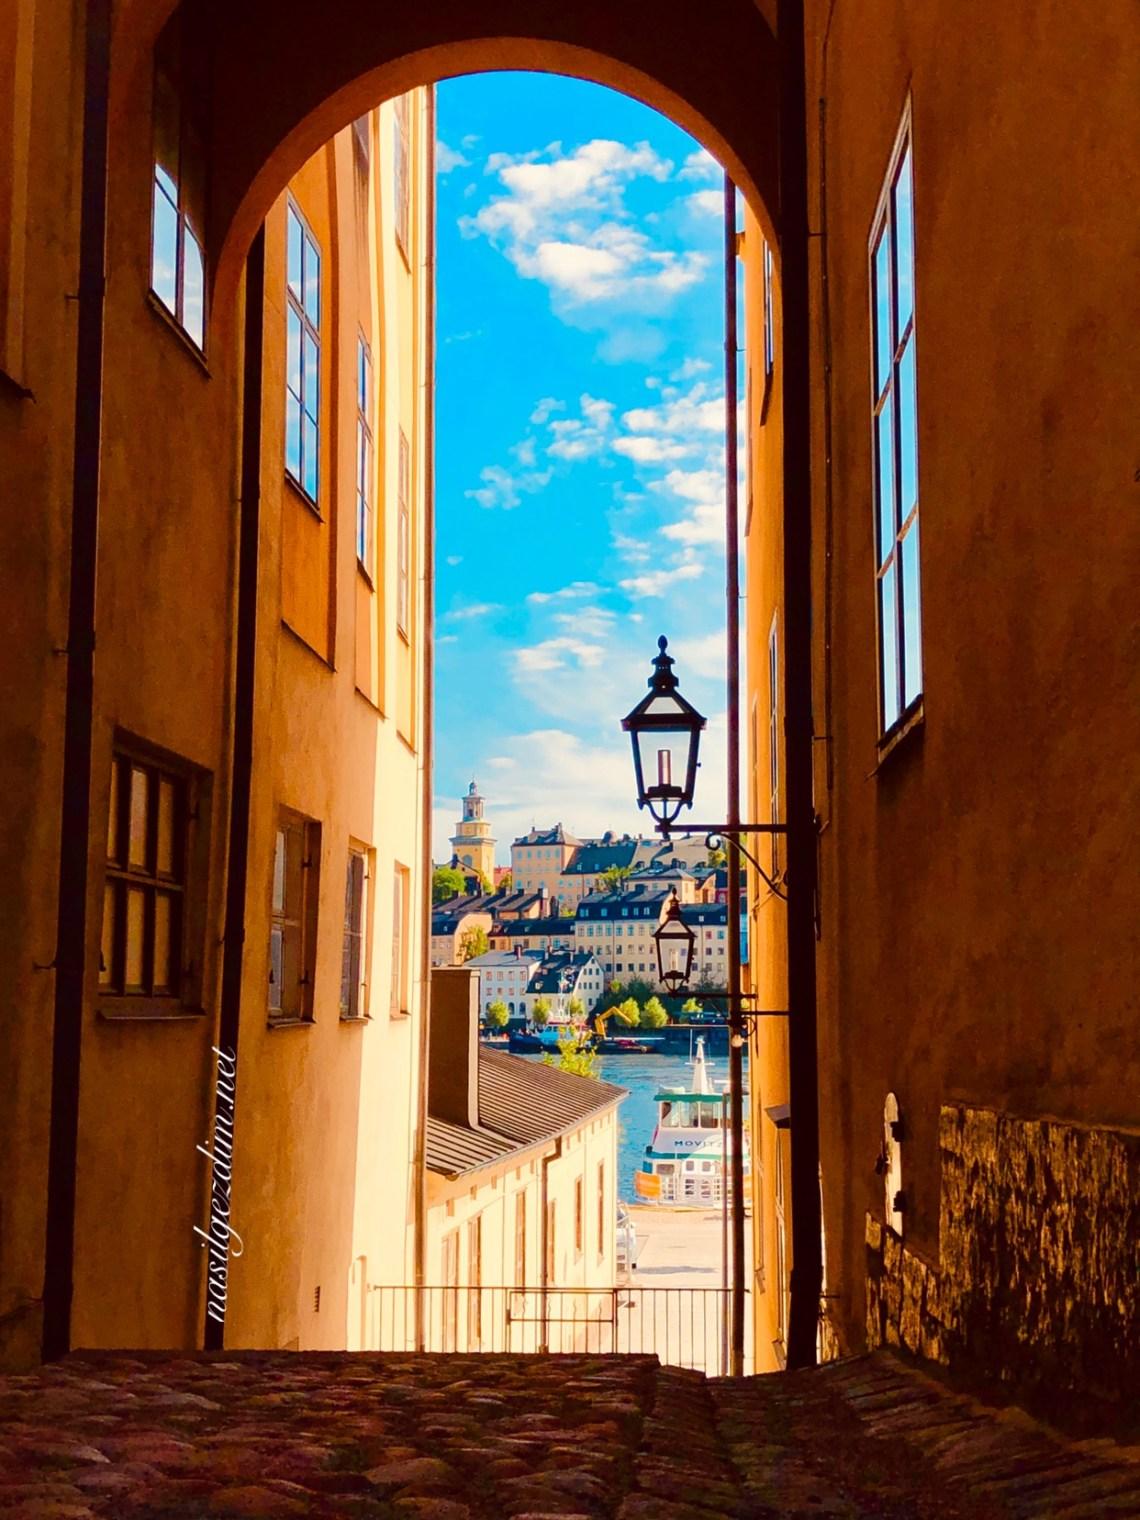 stockholm isveç, stockholm gezi rehberi, stockholm gezilecek yerler, isveç gezi rehberi, stockholm isveç gezilecek yerler, nasil gezdim, nasilgezdim, isveç gezilecek yerler. stockholm gezisi